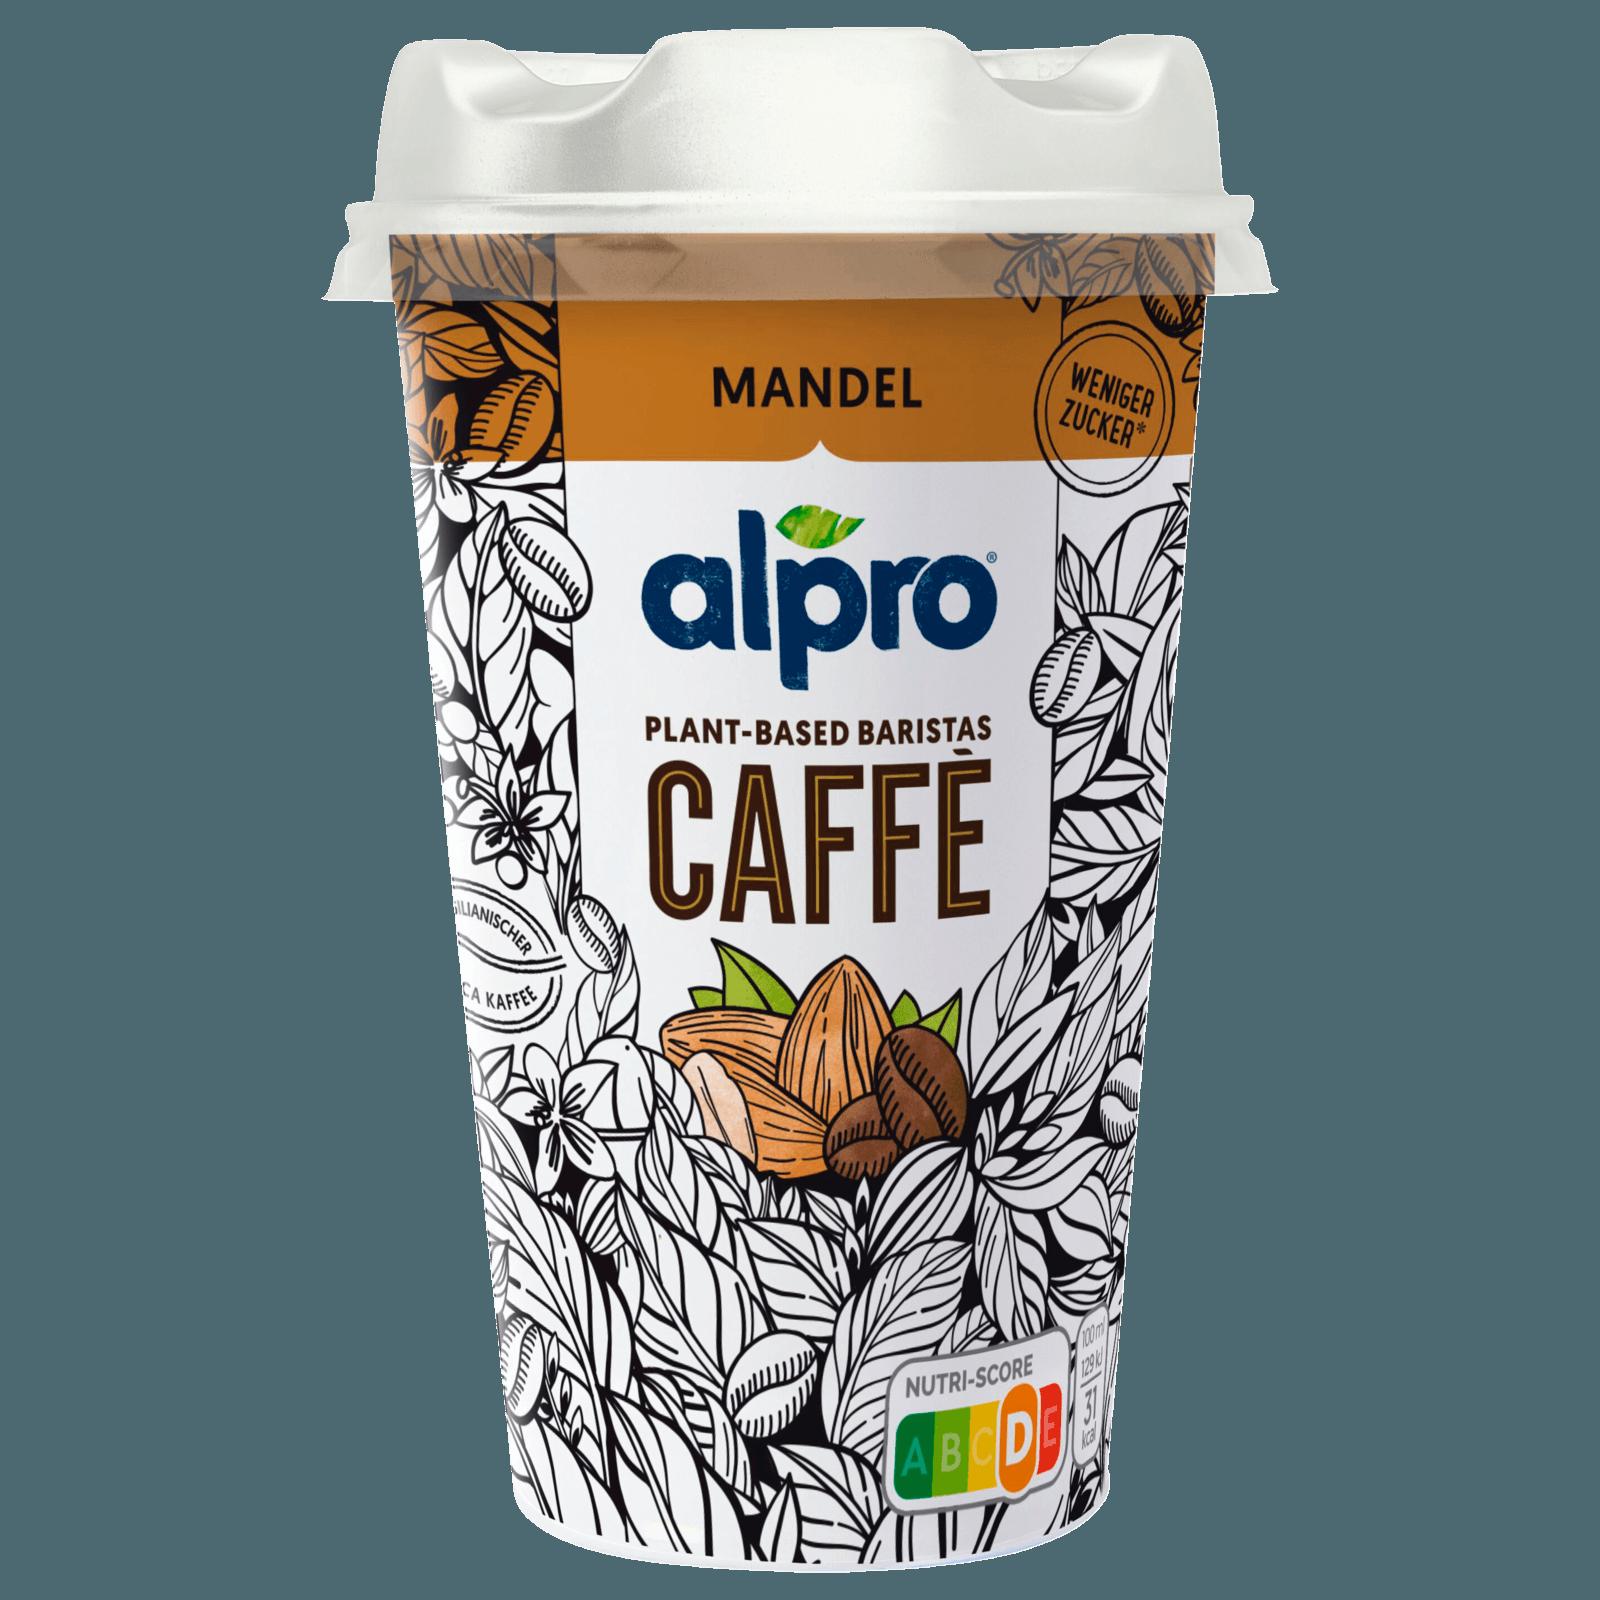 Alpro Caffè Brasilianischer Kaffee & Mandel 235ml